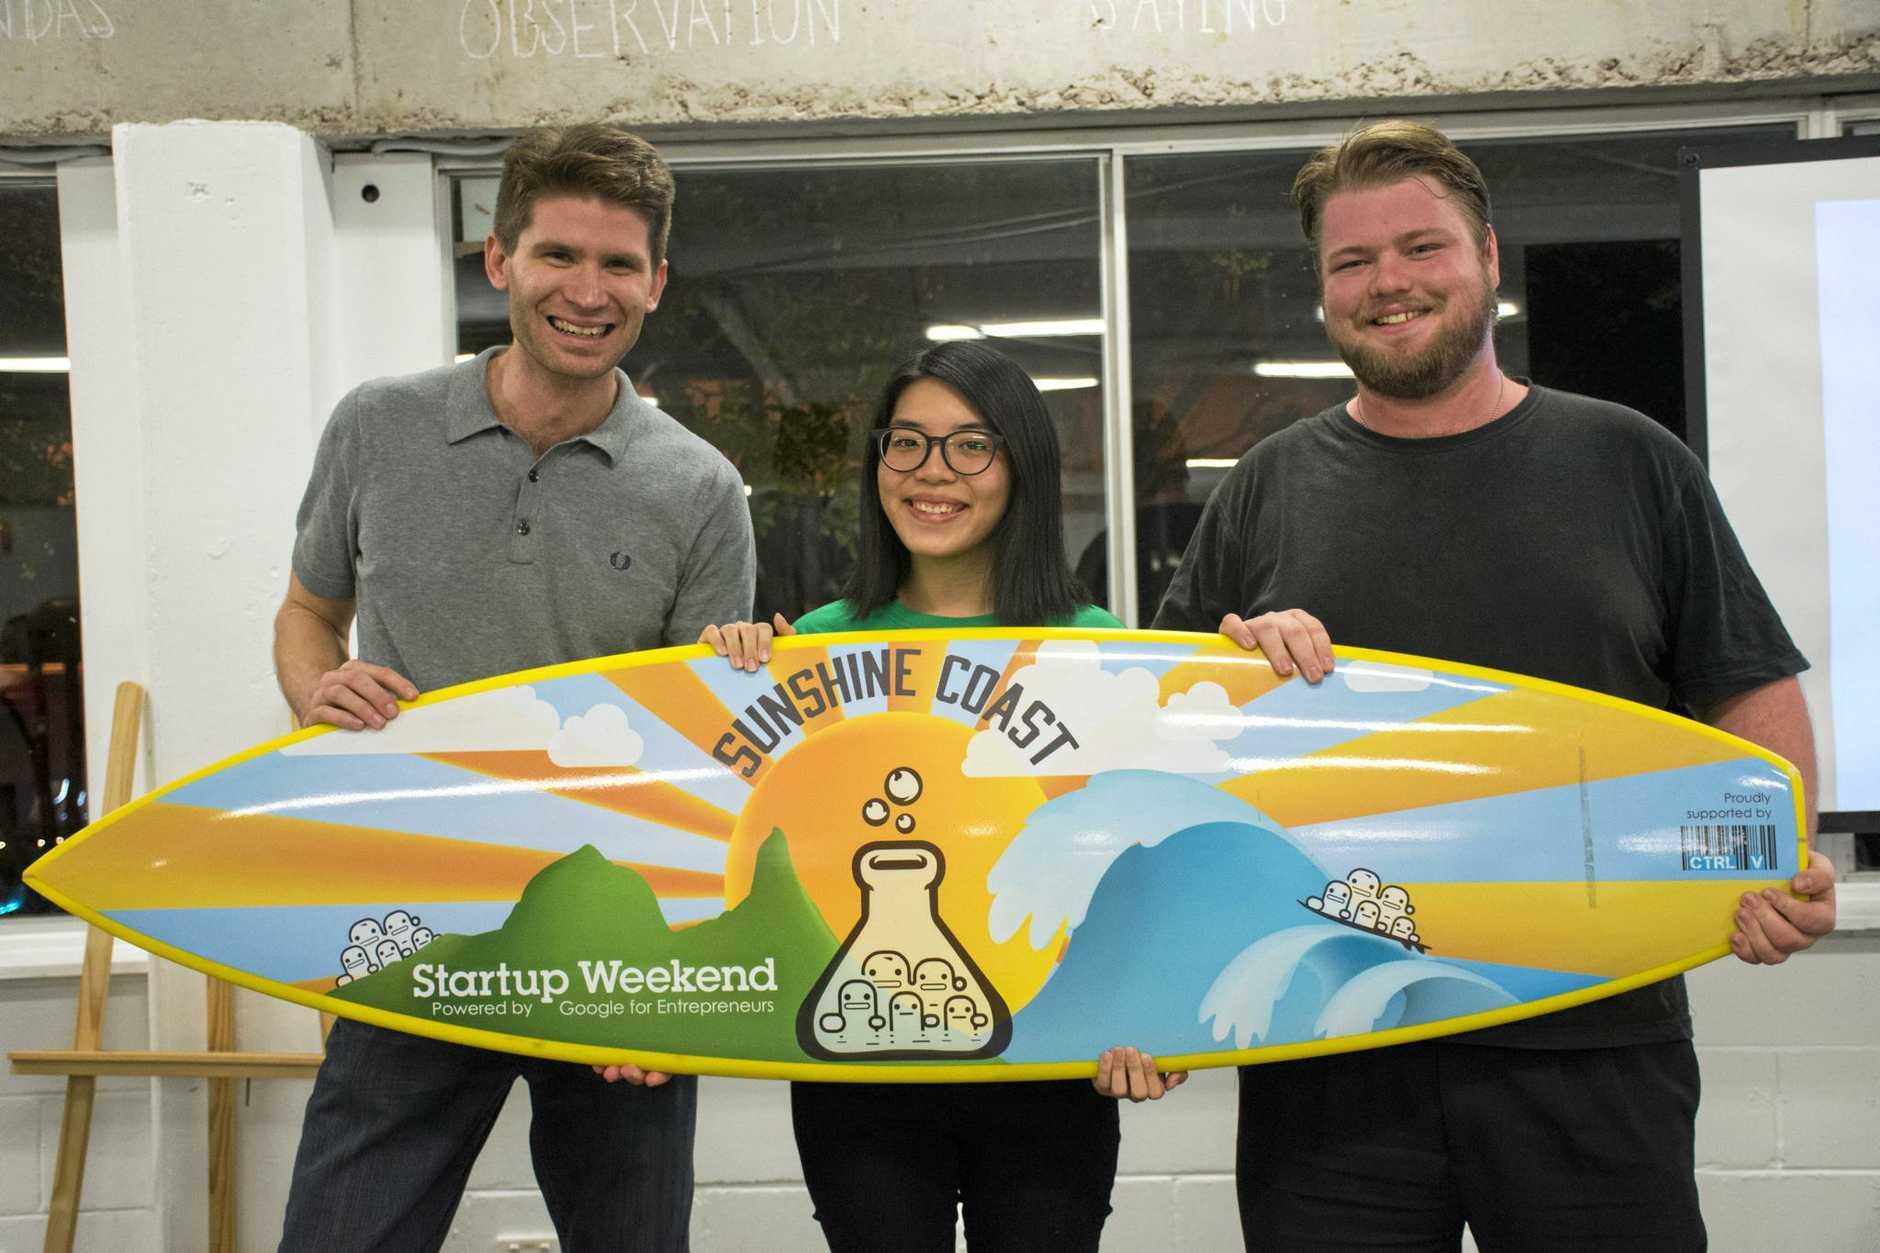 Startup Weekend Sunshine Coast 2017 winners Brendan Temple, Ann Liew and Chris Jolly.